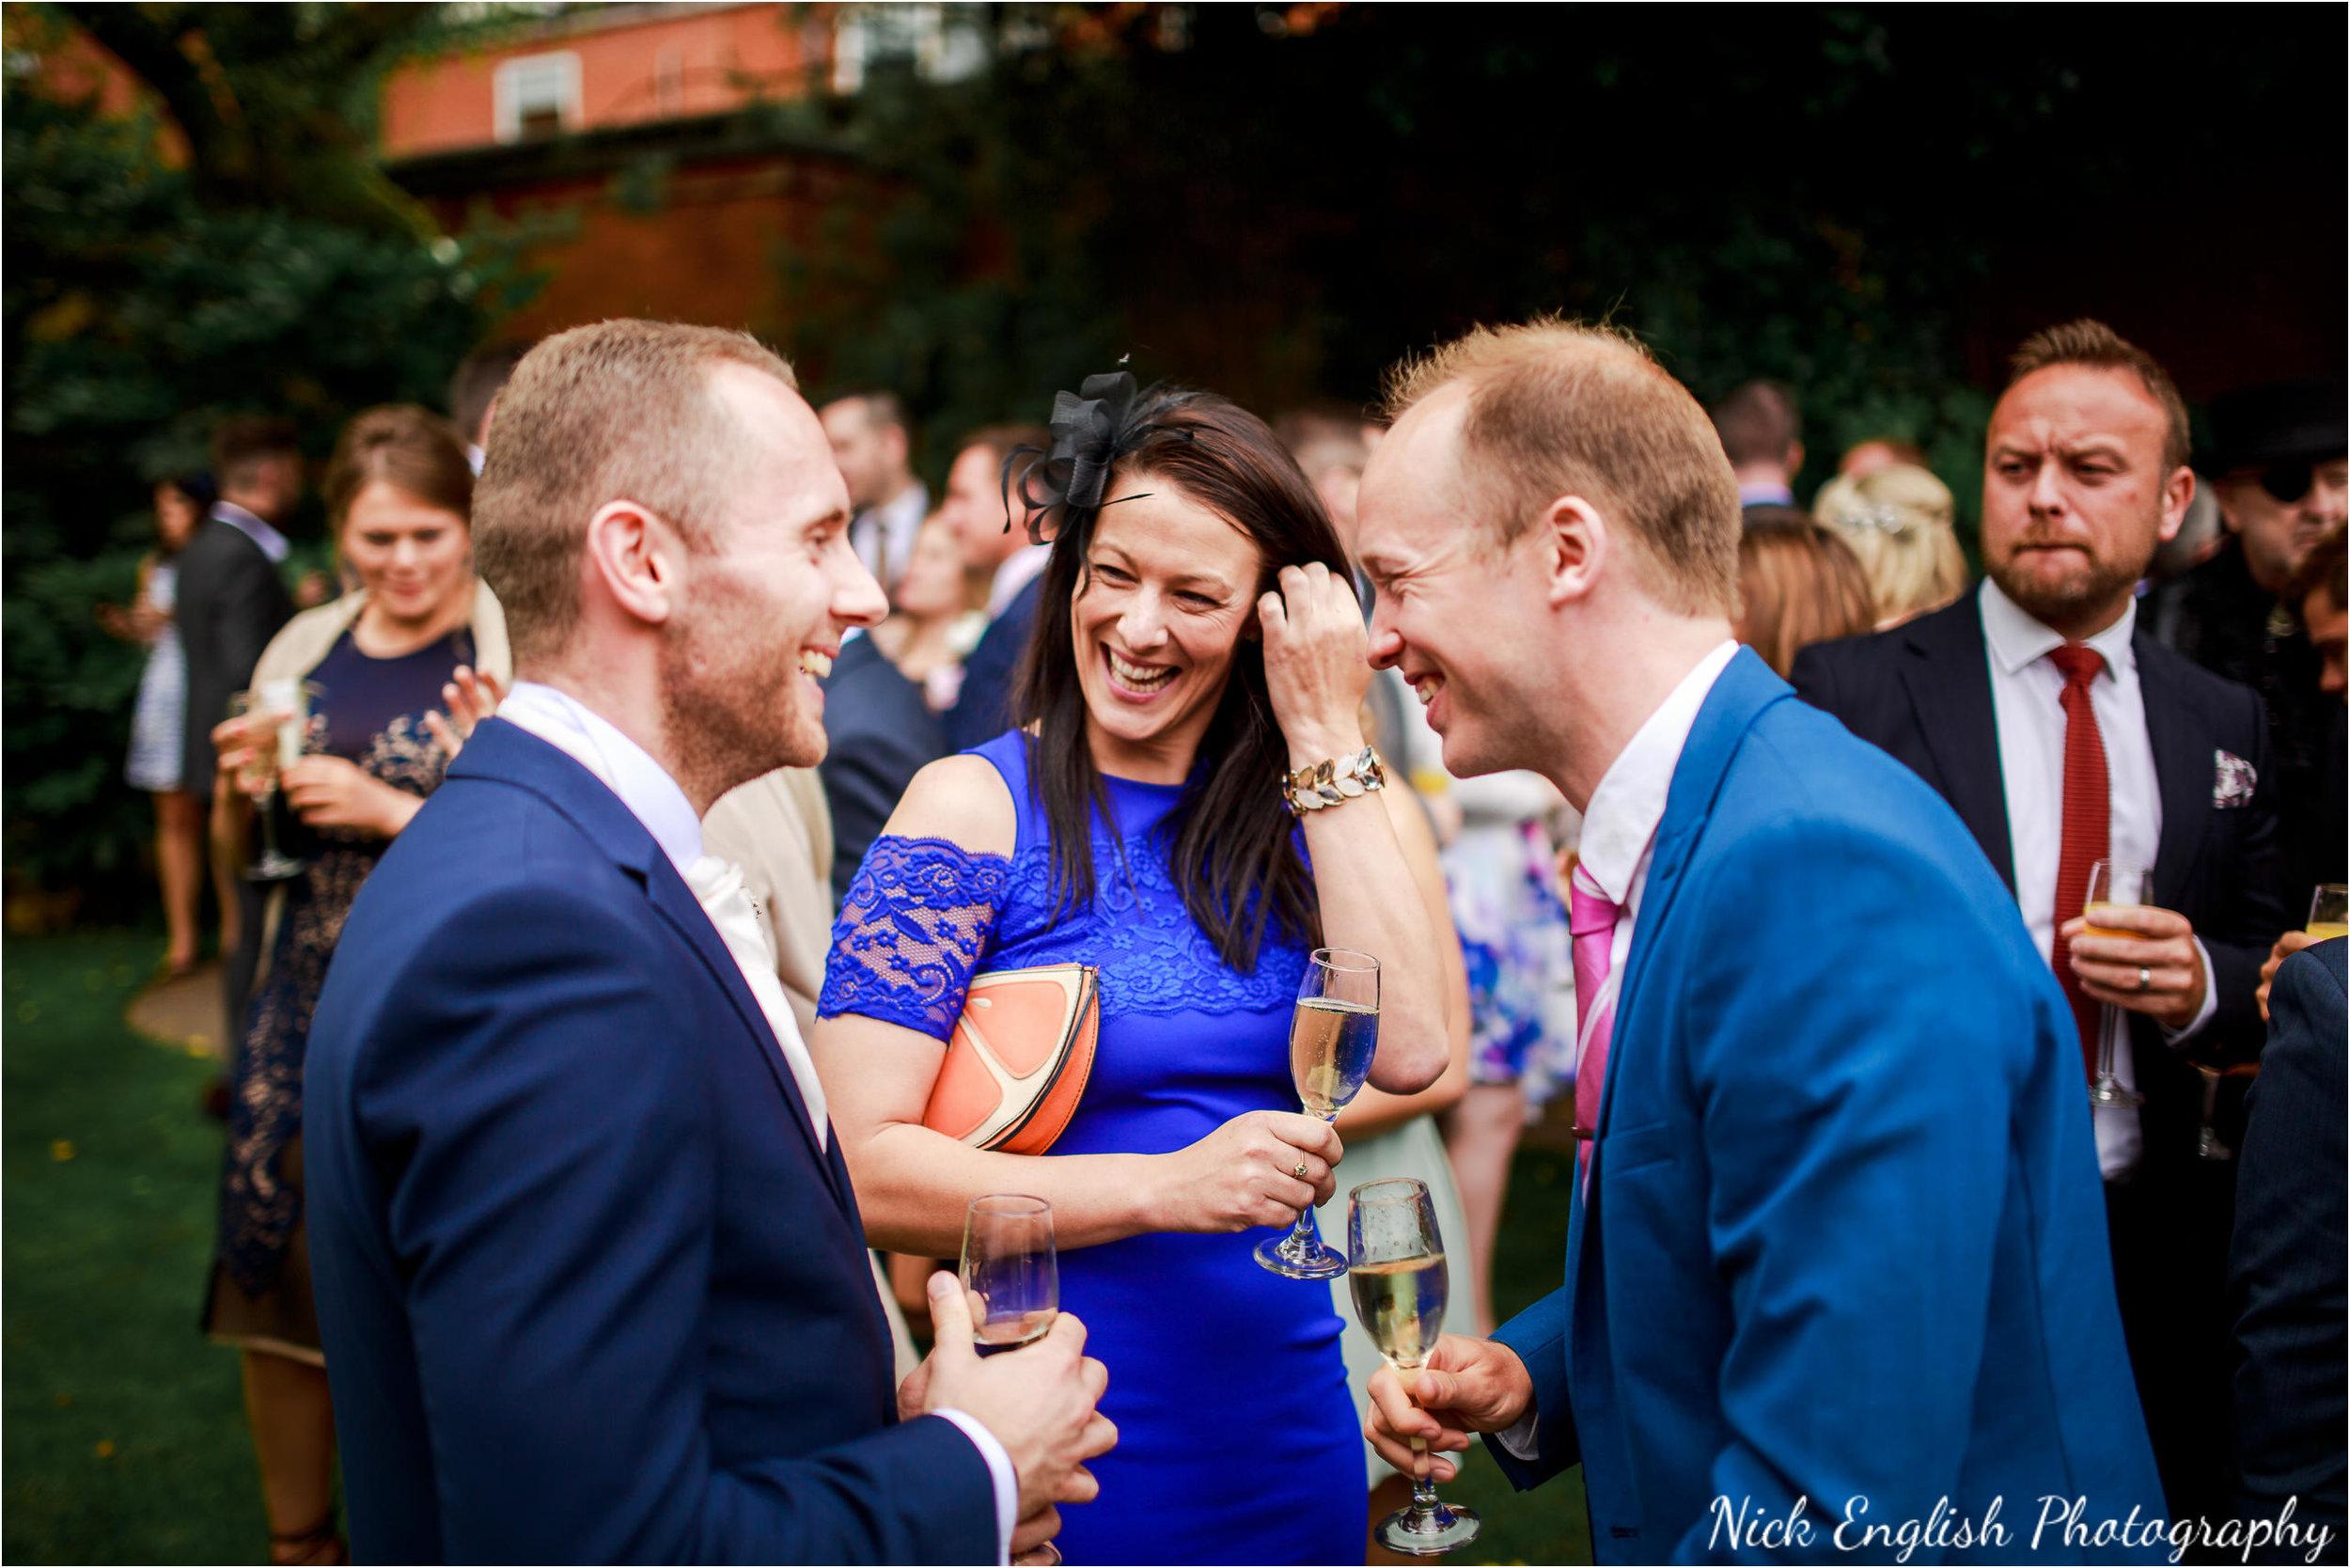 Emily David Wedding Photographs at Barton Grange Preston by Nick English Photography 106jpg.jpeg